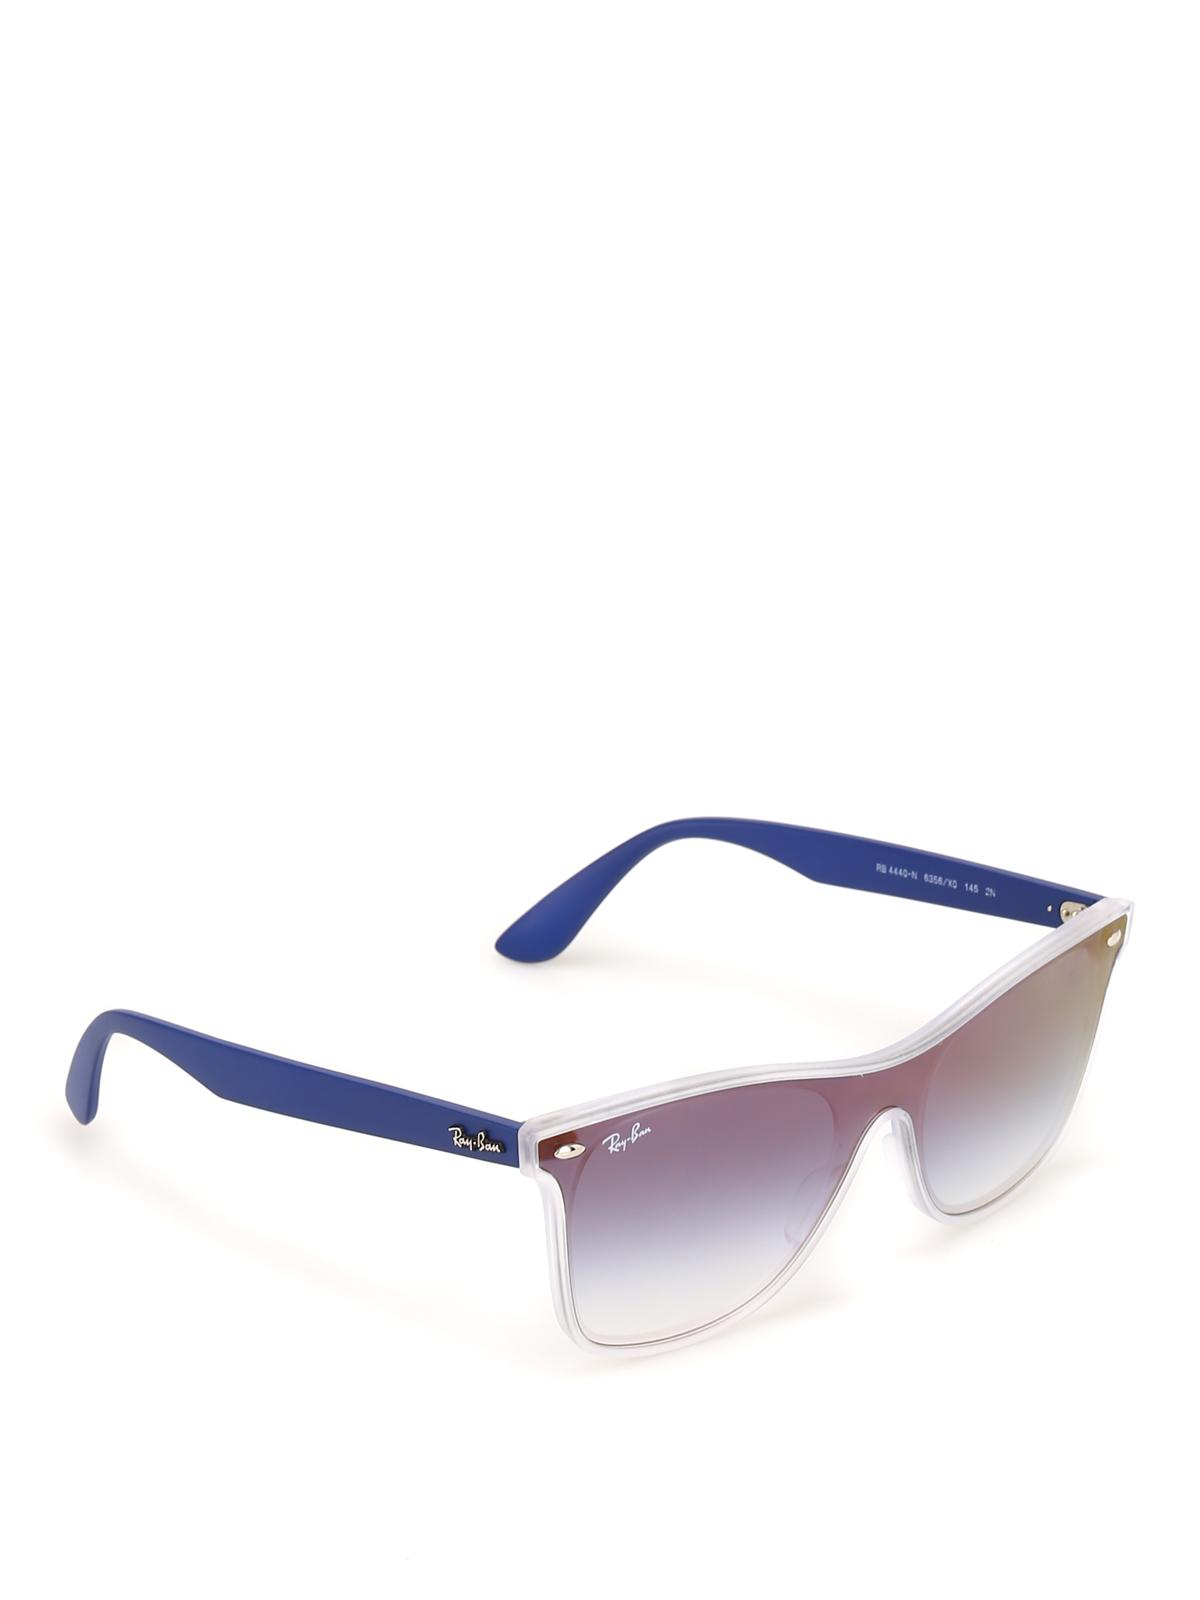 f1fb07fe6ba Ray Ban - Blaze Wayfarer sunglasses - sunglasses - RB4440N6356X0